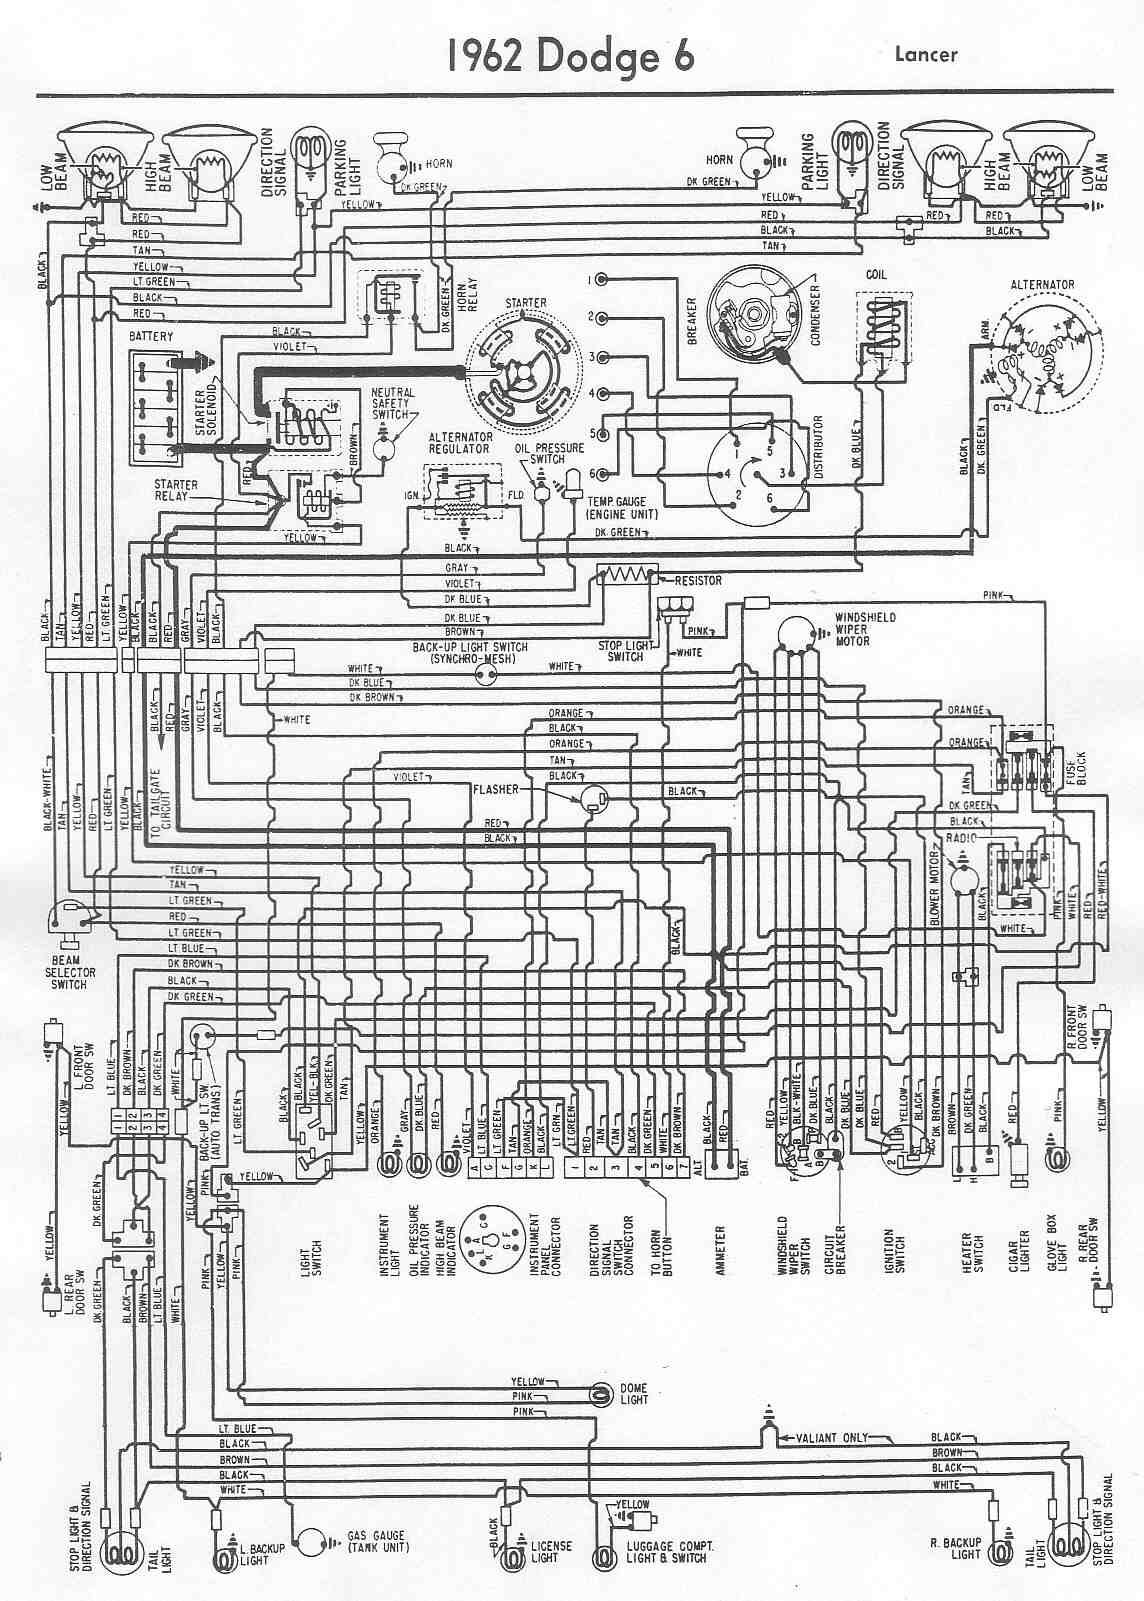 1950 Oldsmobile Wiring Diagram | Wiring Diagram on